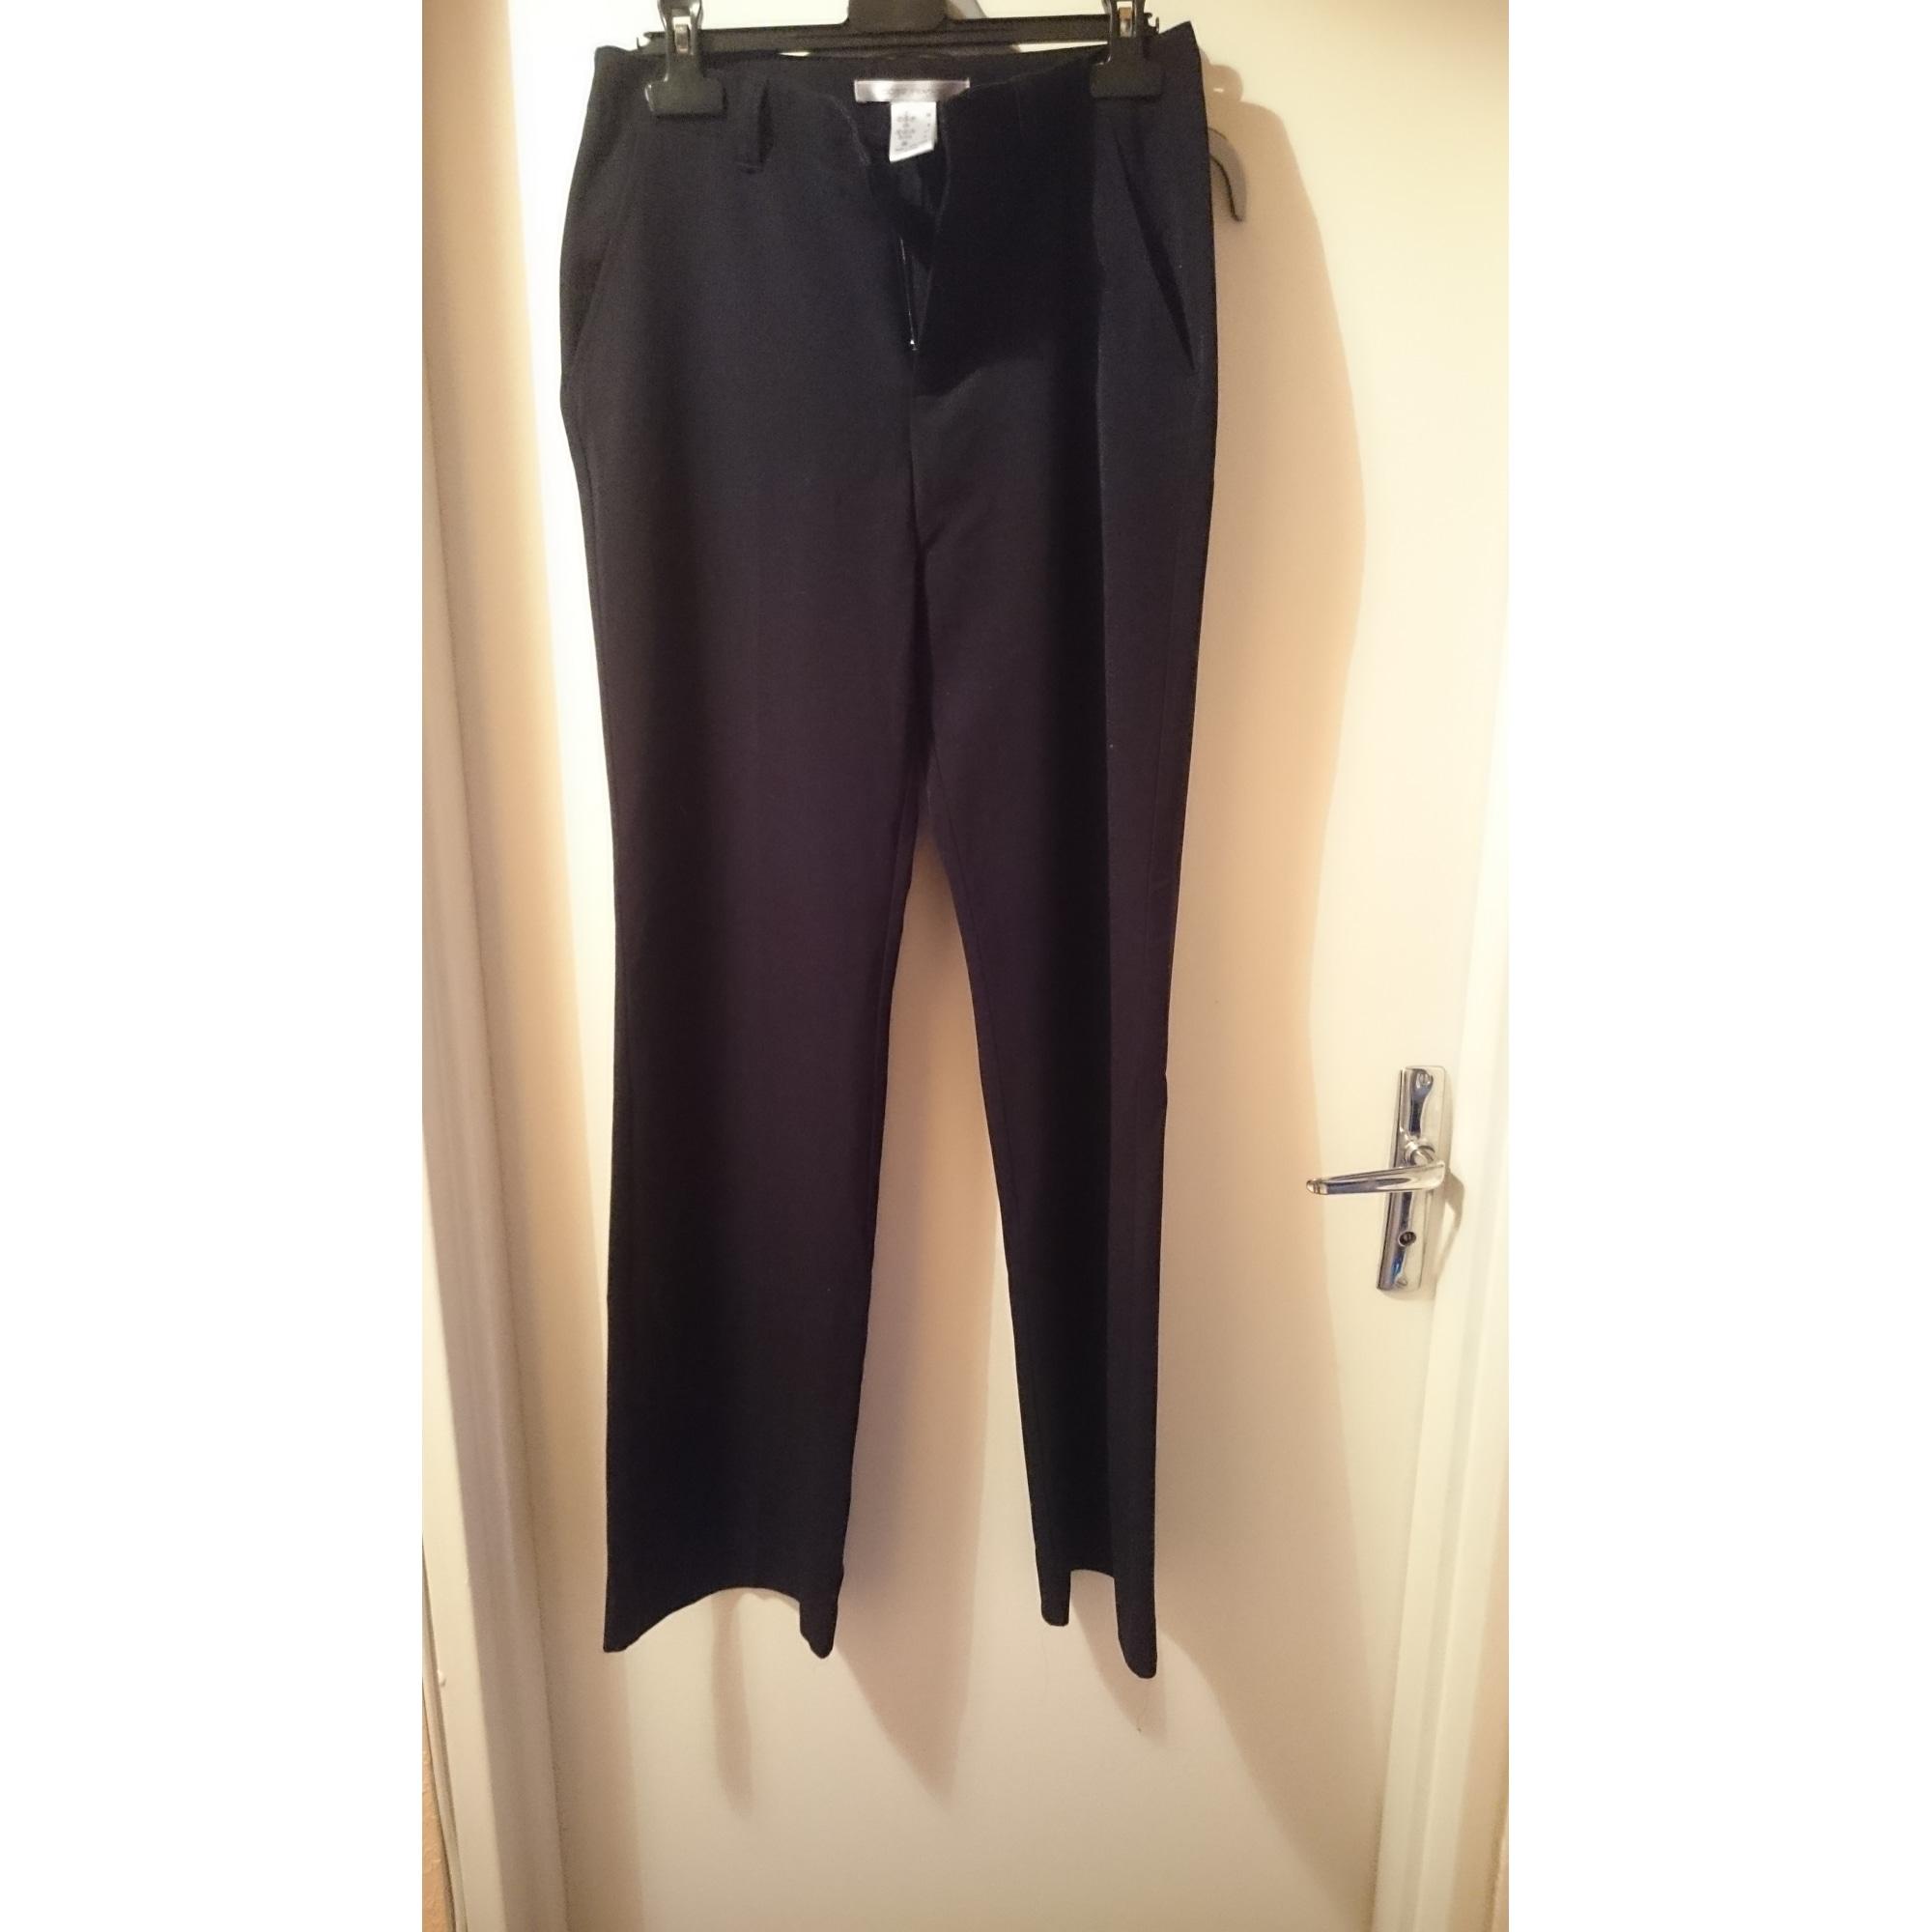 Straight Leg Pants CÔTÉ FEMME Black